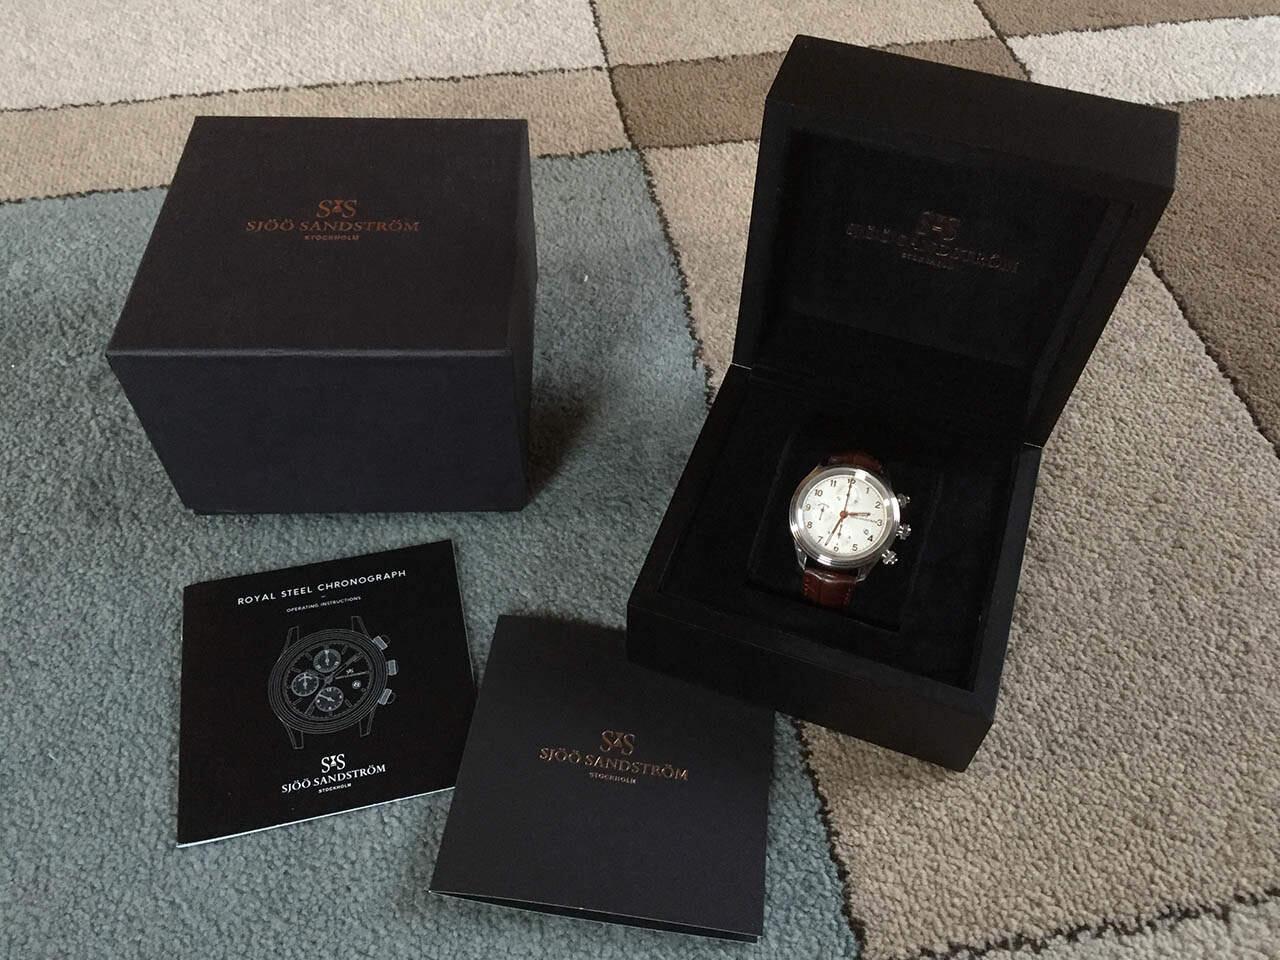 Sjöö Sandström Royal Steel Chronograph -kellon fullset.